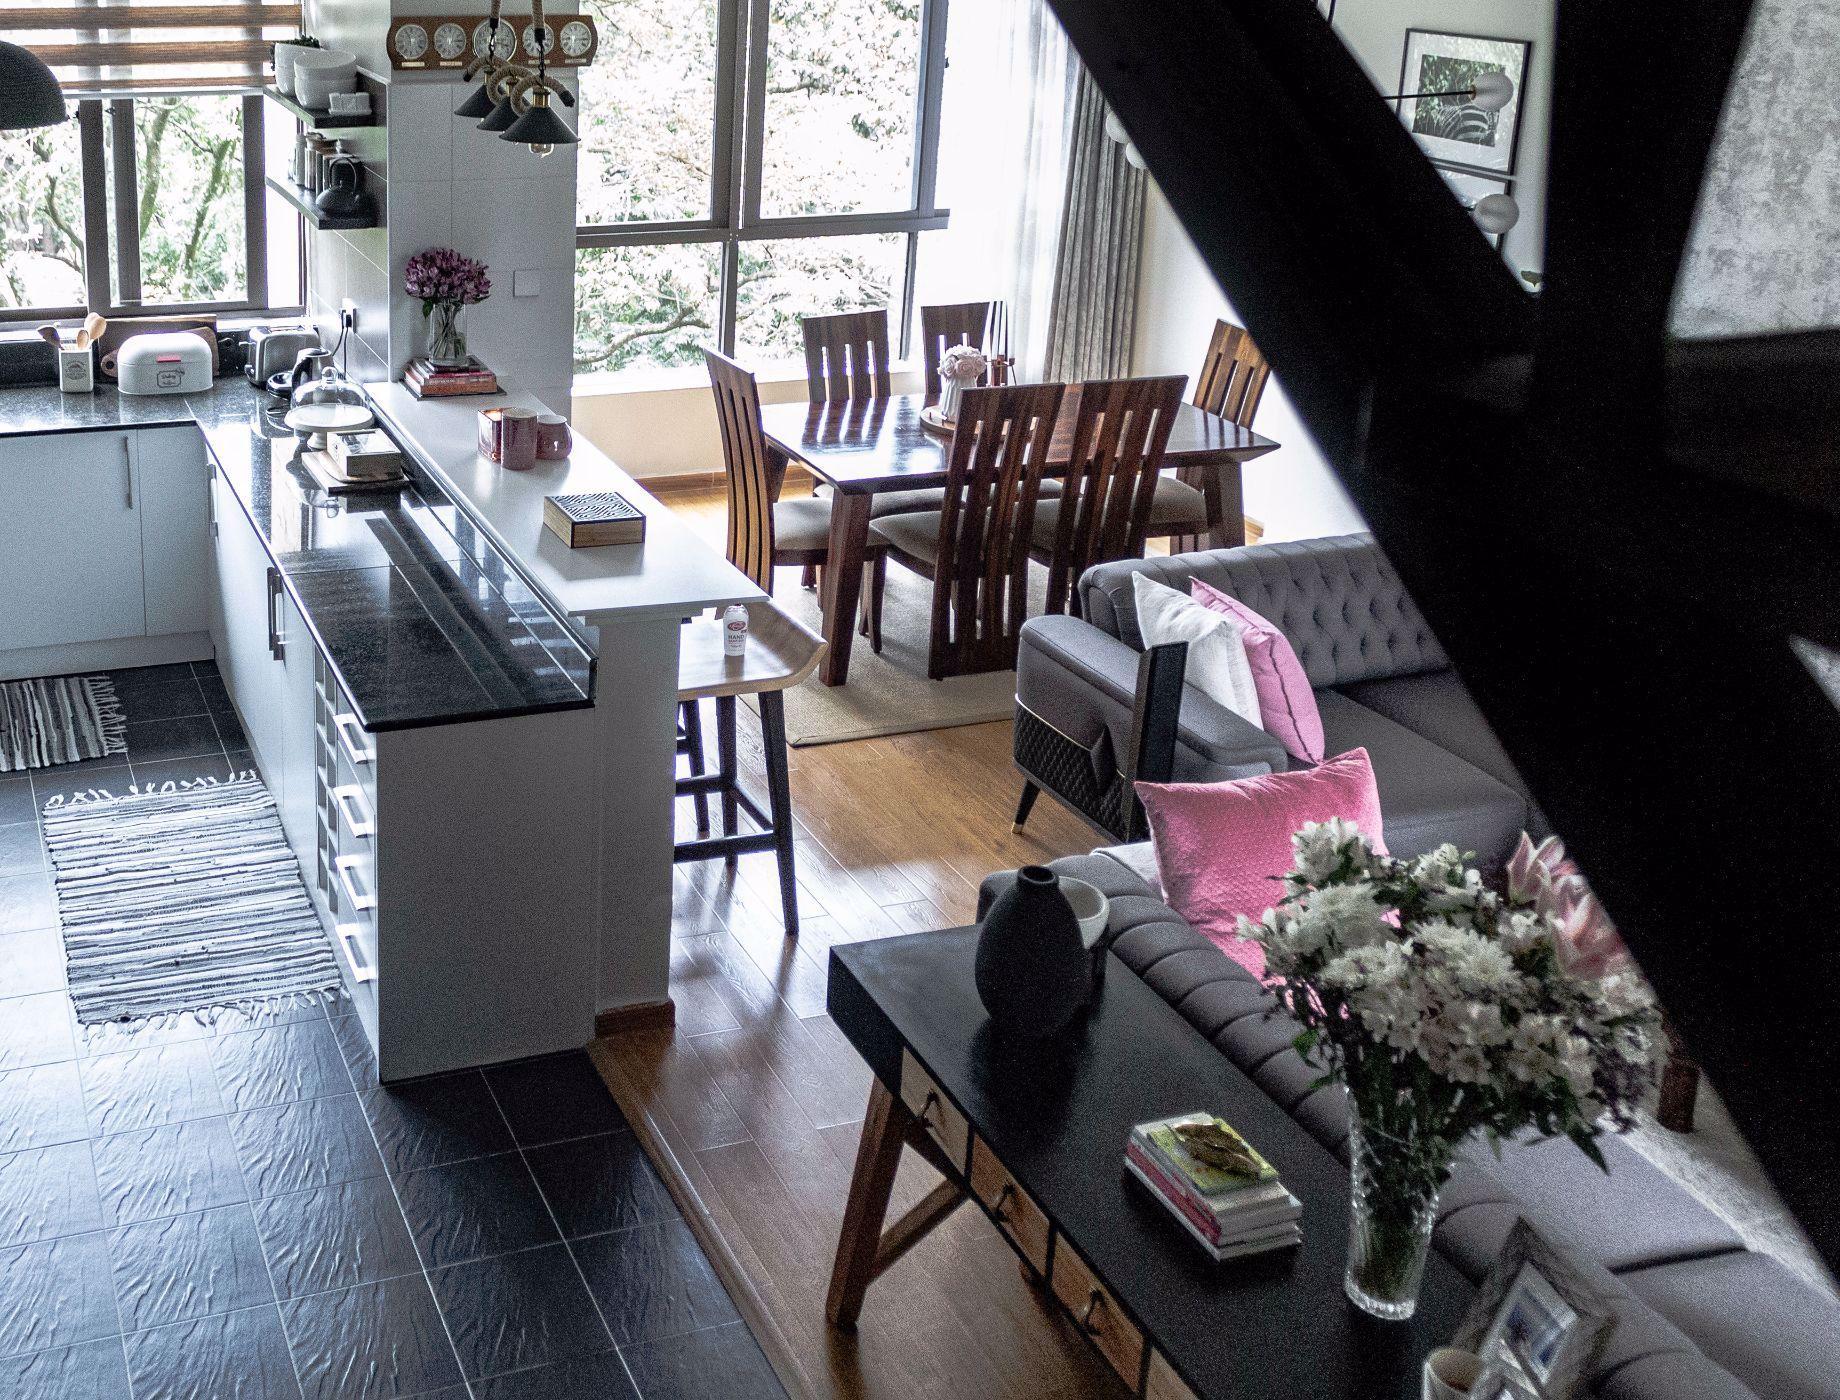 3 bedroom double-storey apartment to rent in Kilimani (Kenya)